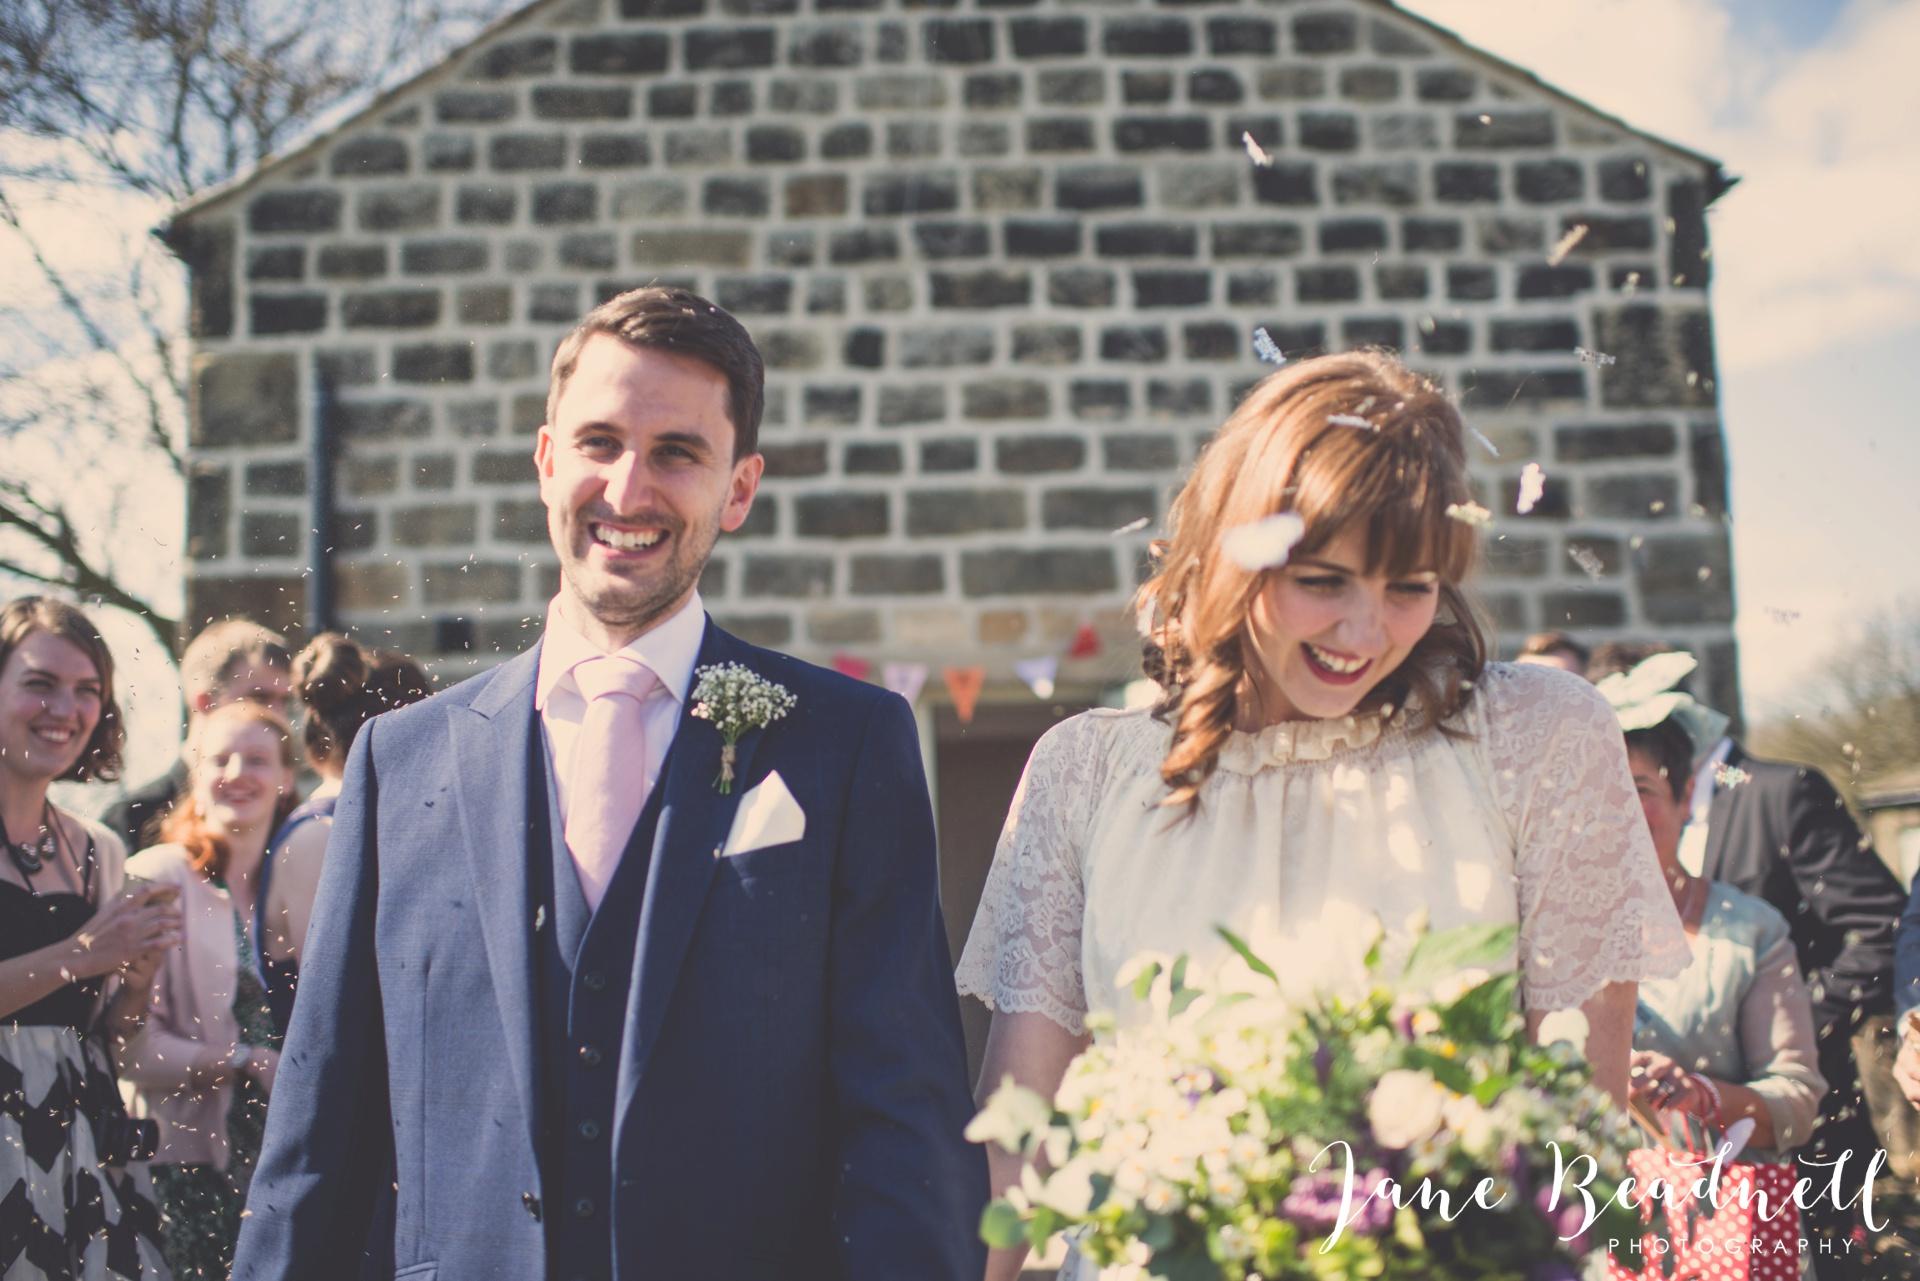 Jane Beadnell fine art wedding photographer The Cheerful Chilli Barn Otley_0027